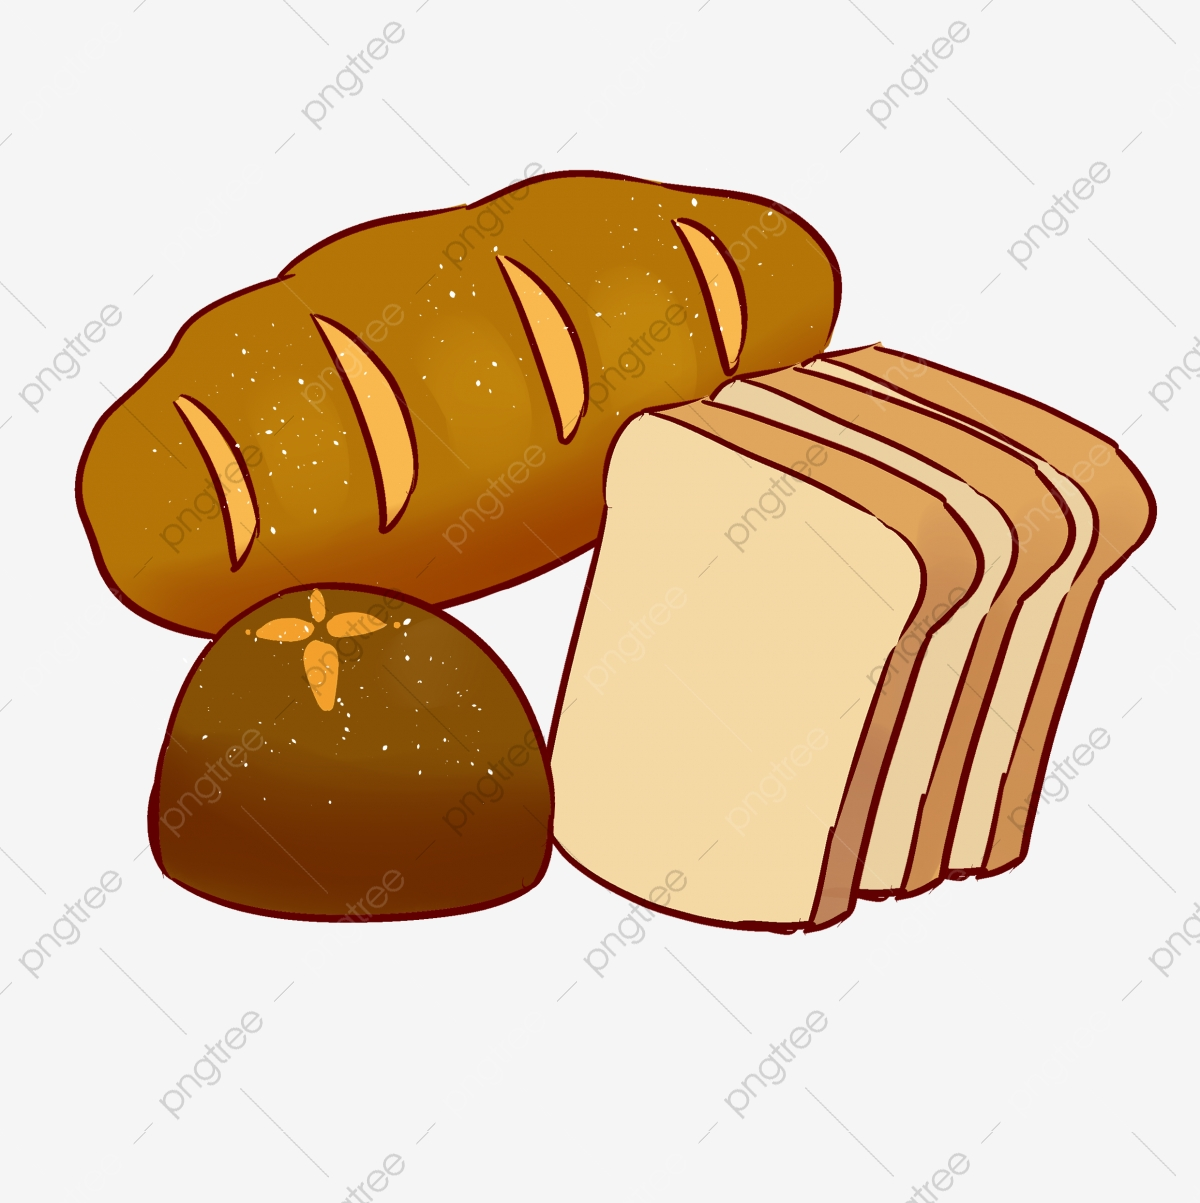 Bakery logo image health. Clipart bread file